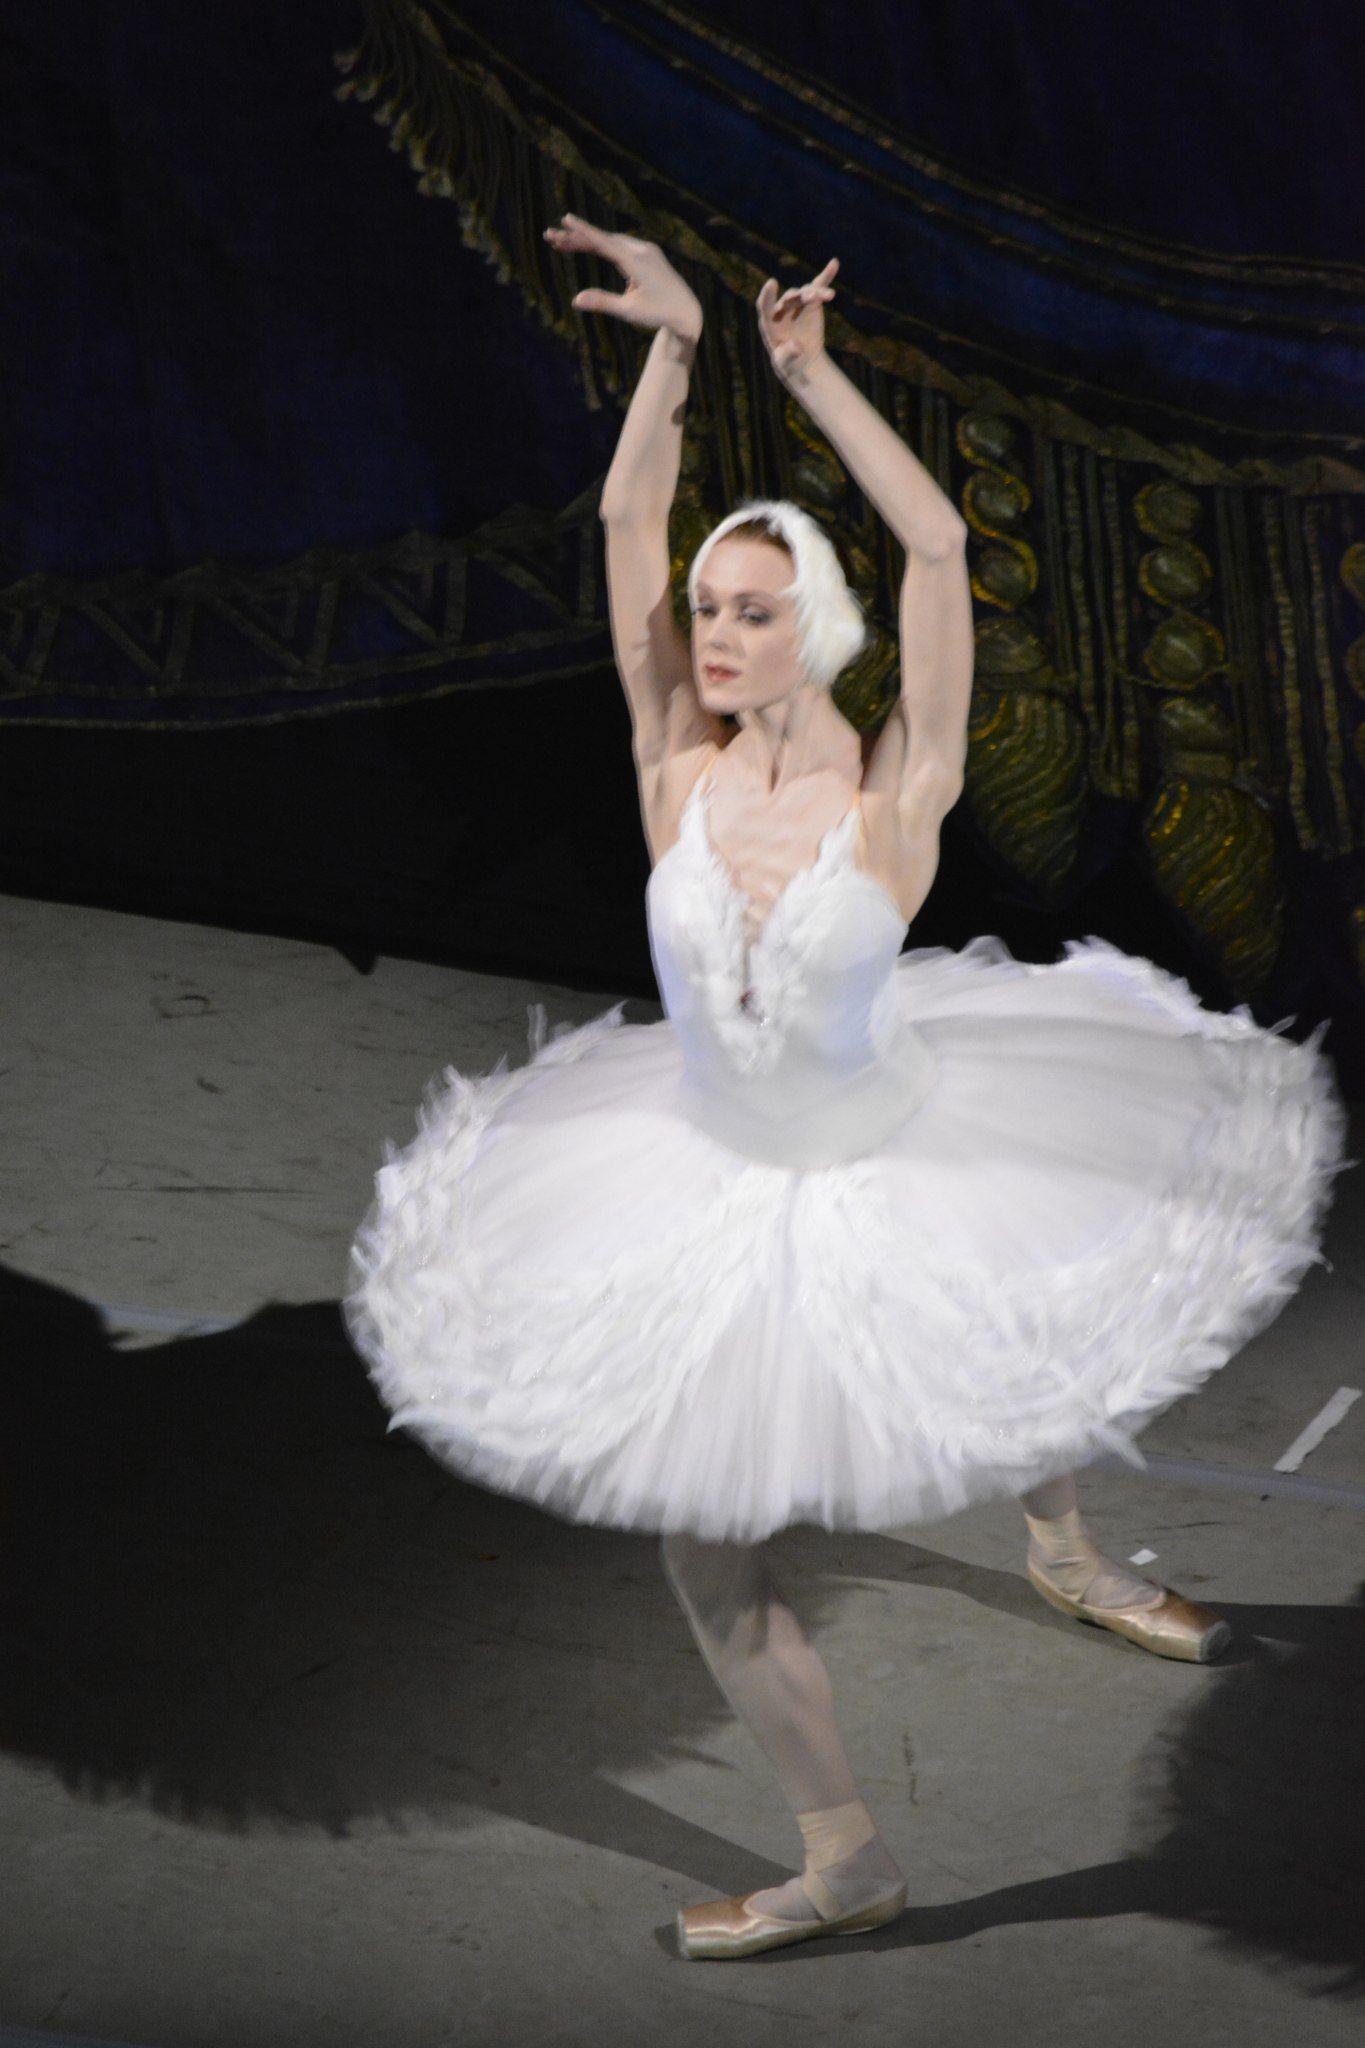 Musique De Danse Classique : musique, danse, classique, Ulyana, Lopatkina, Danse, Classique,, Danseuse,, Ballerine